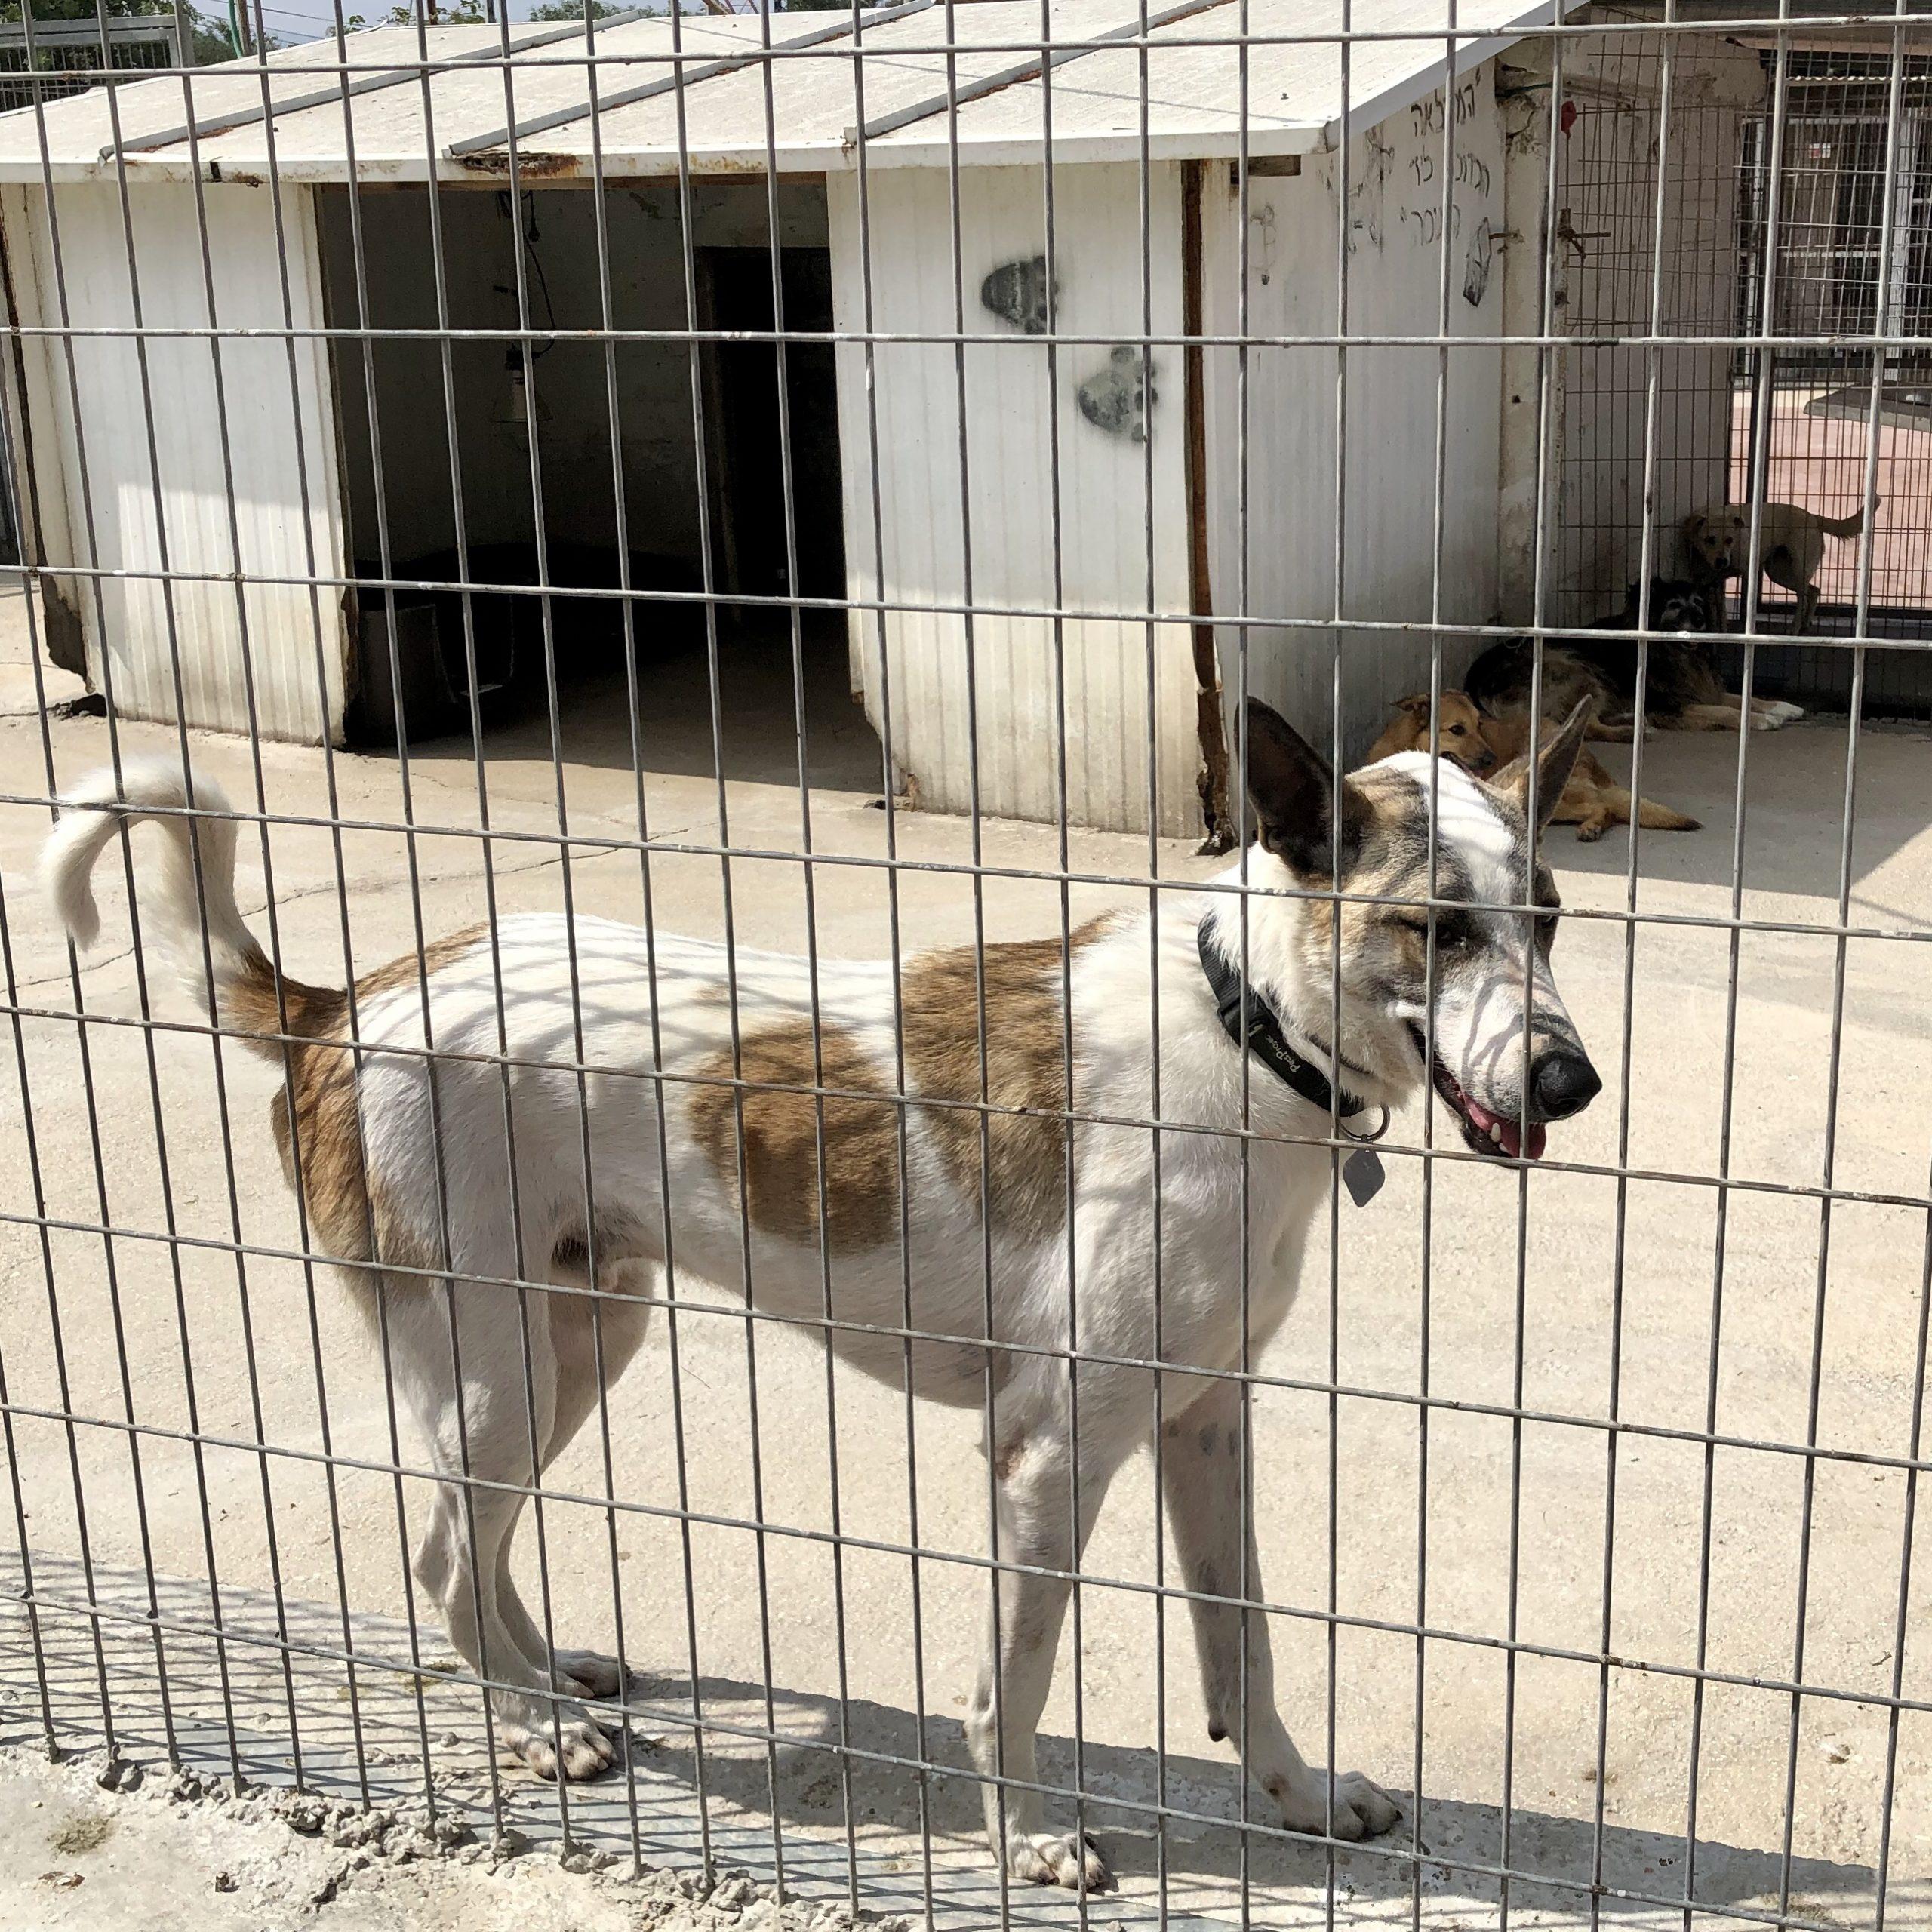 Dog adoption in Israel